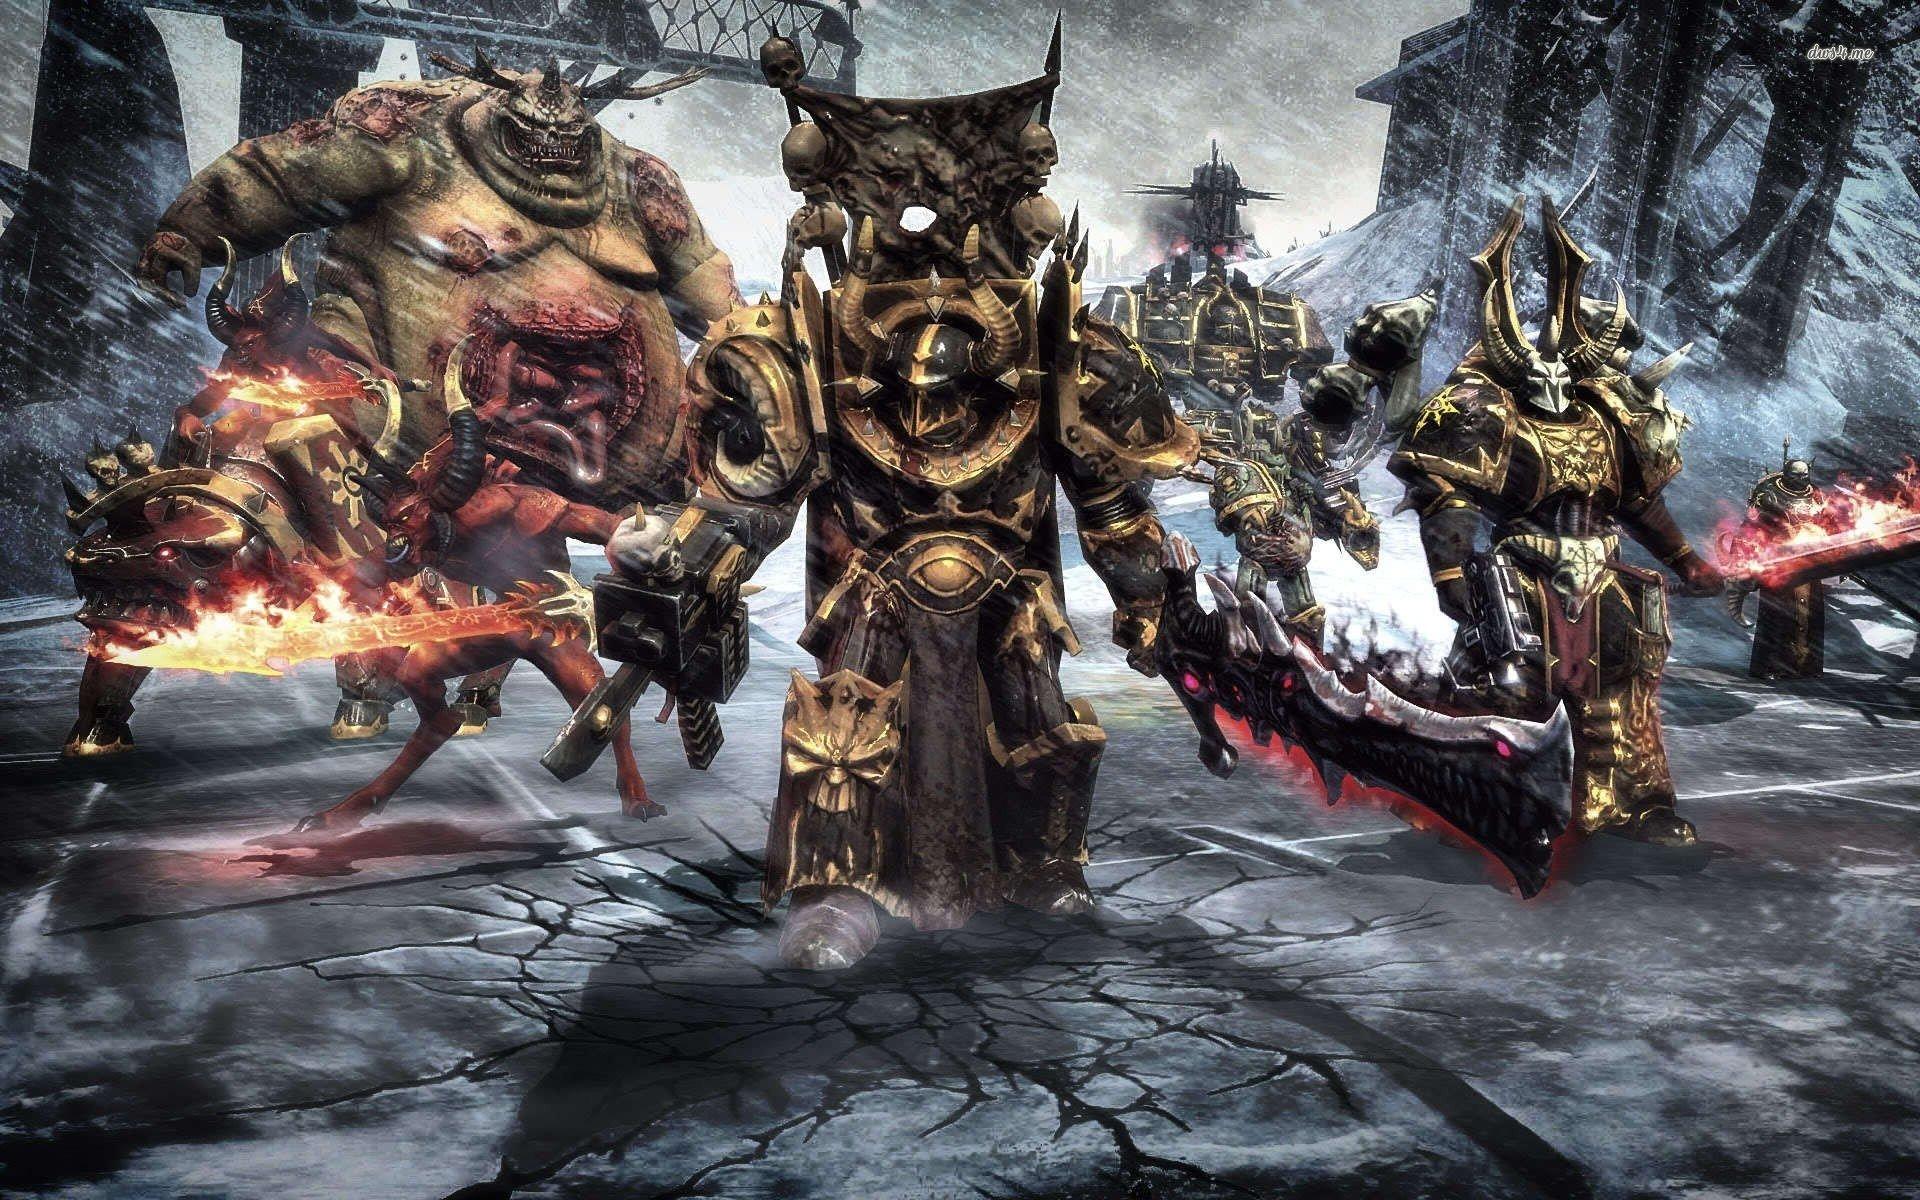 Warhammer clipart 1080p 40k Source: Chaos Warhammer Images: